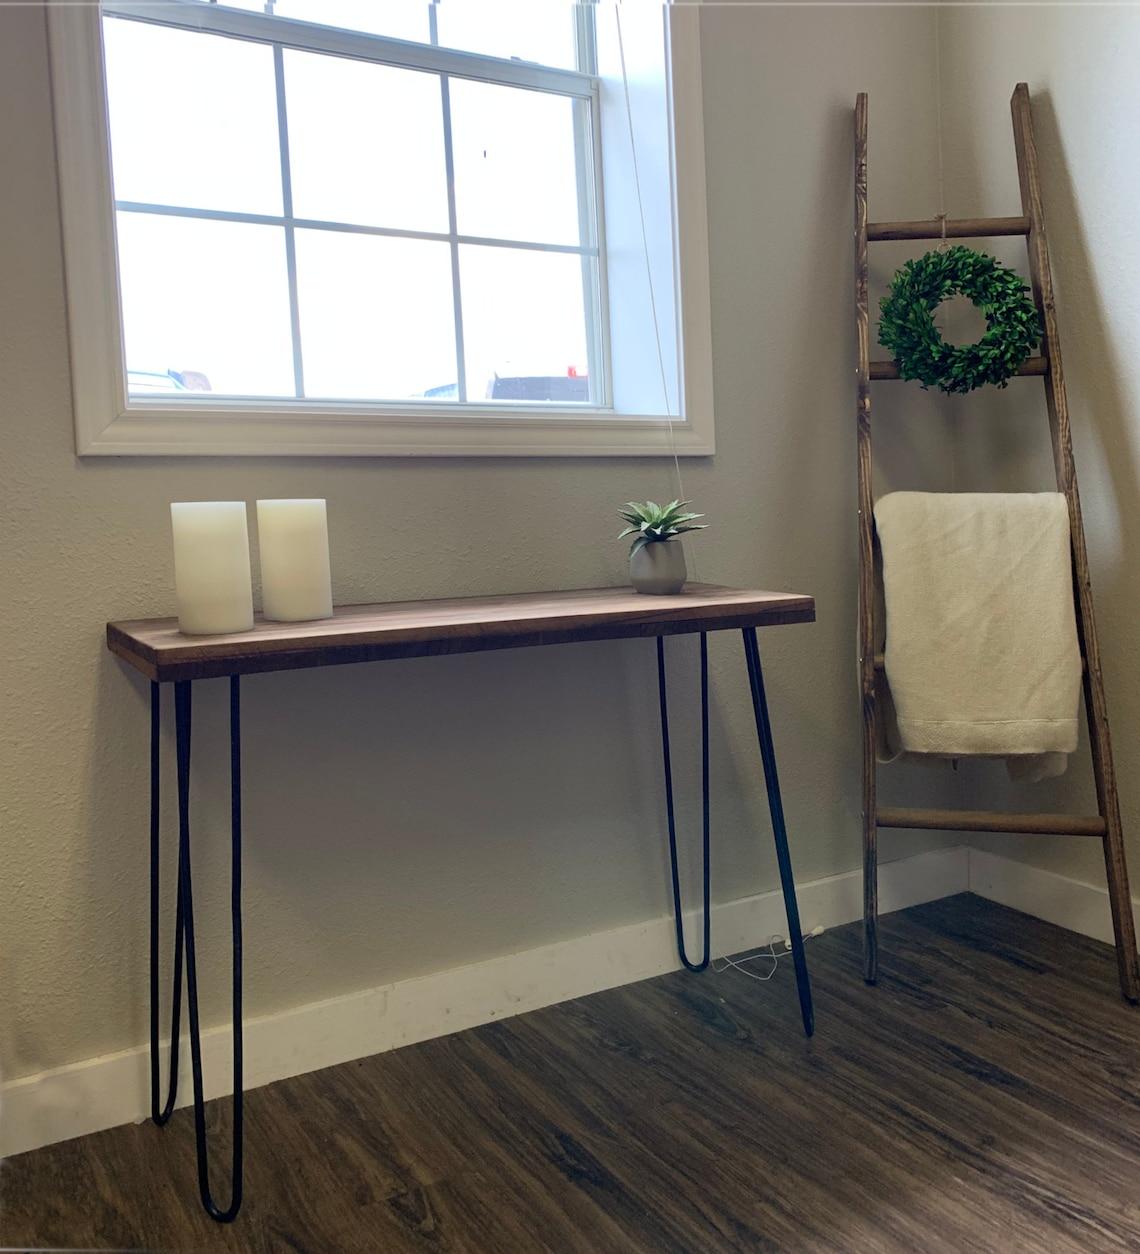 "Wood Bench, Farmhouse Decor, Entryway Bench with 34"" Hairpin Legs, Rustic Bench, Narrow Console, Custom Bench Modern Home BenchDecor Wood"